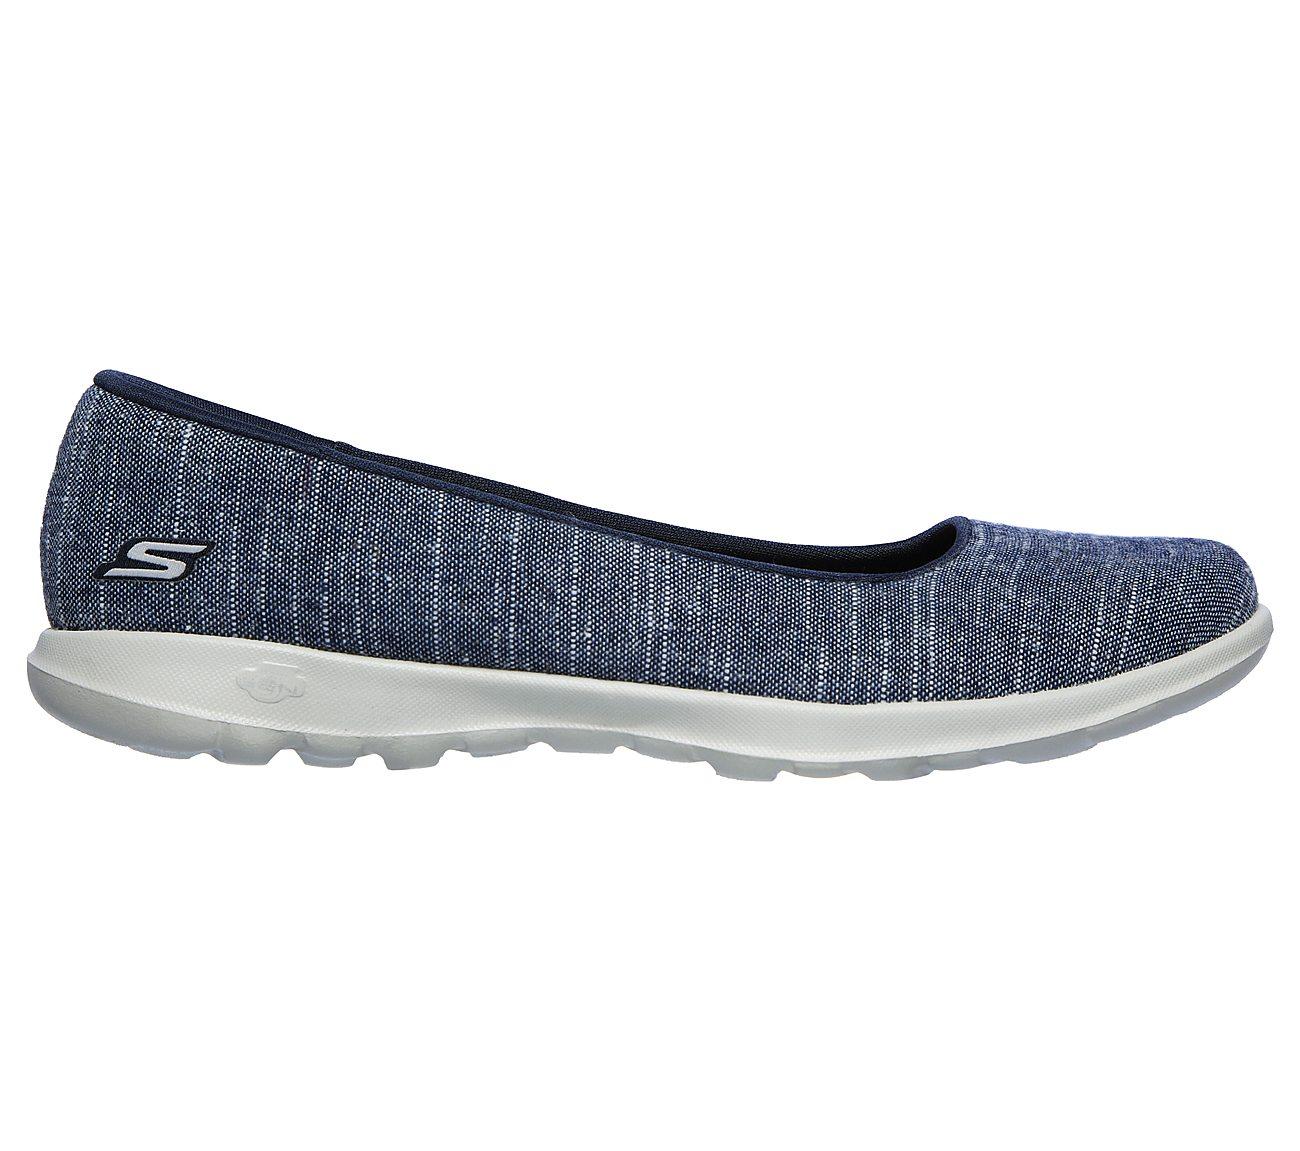 Buy SKECHERS Skechers GOwalk Lite Susie Skechers T7zzH